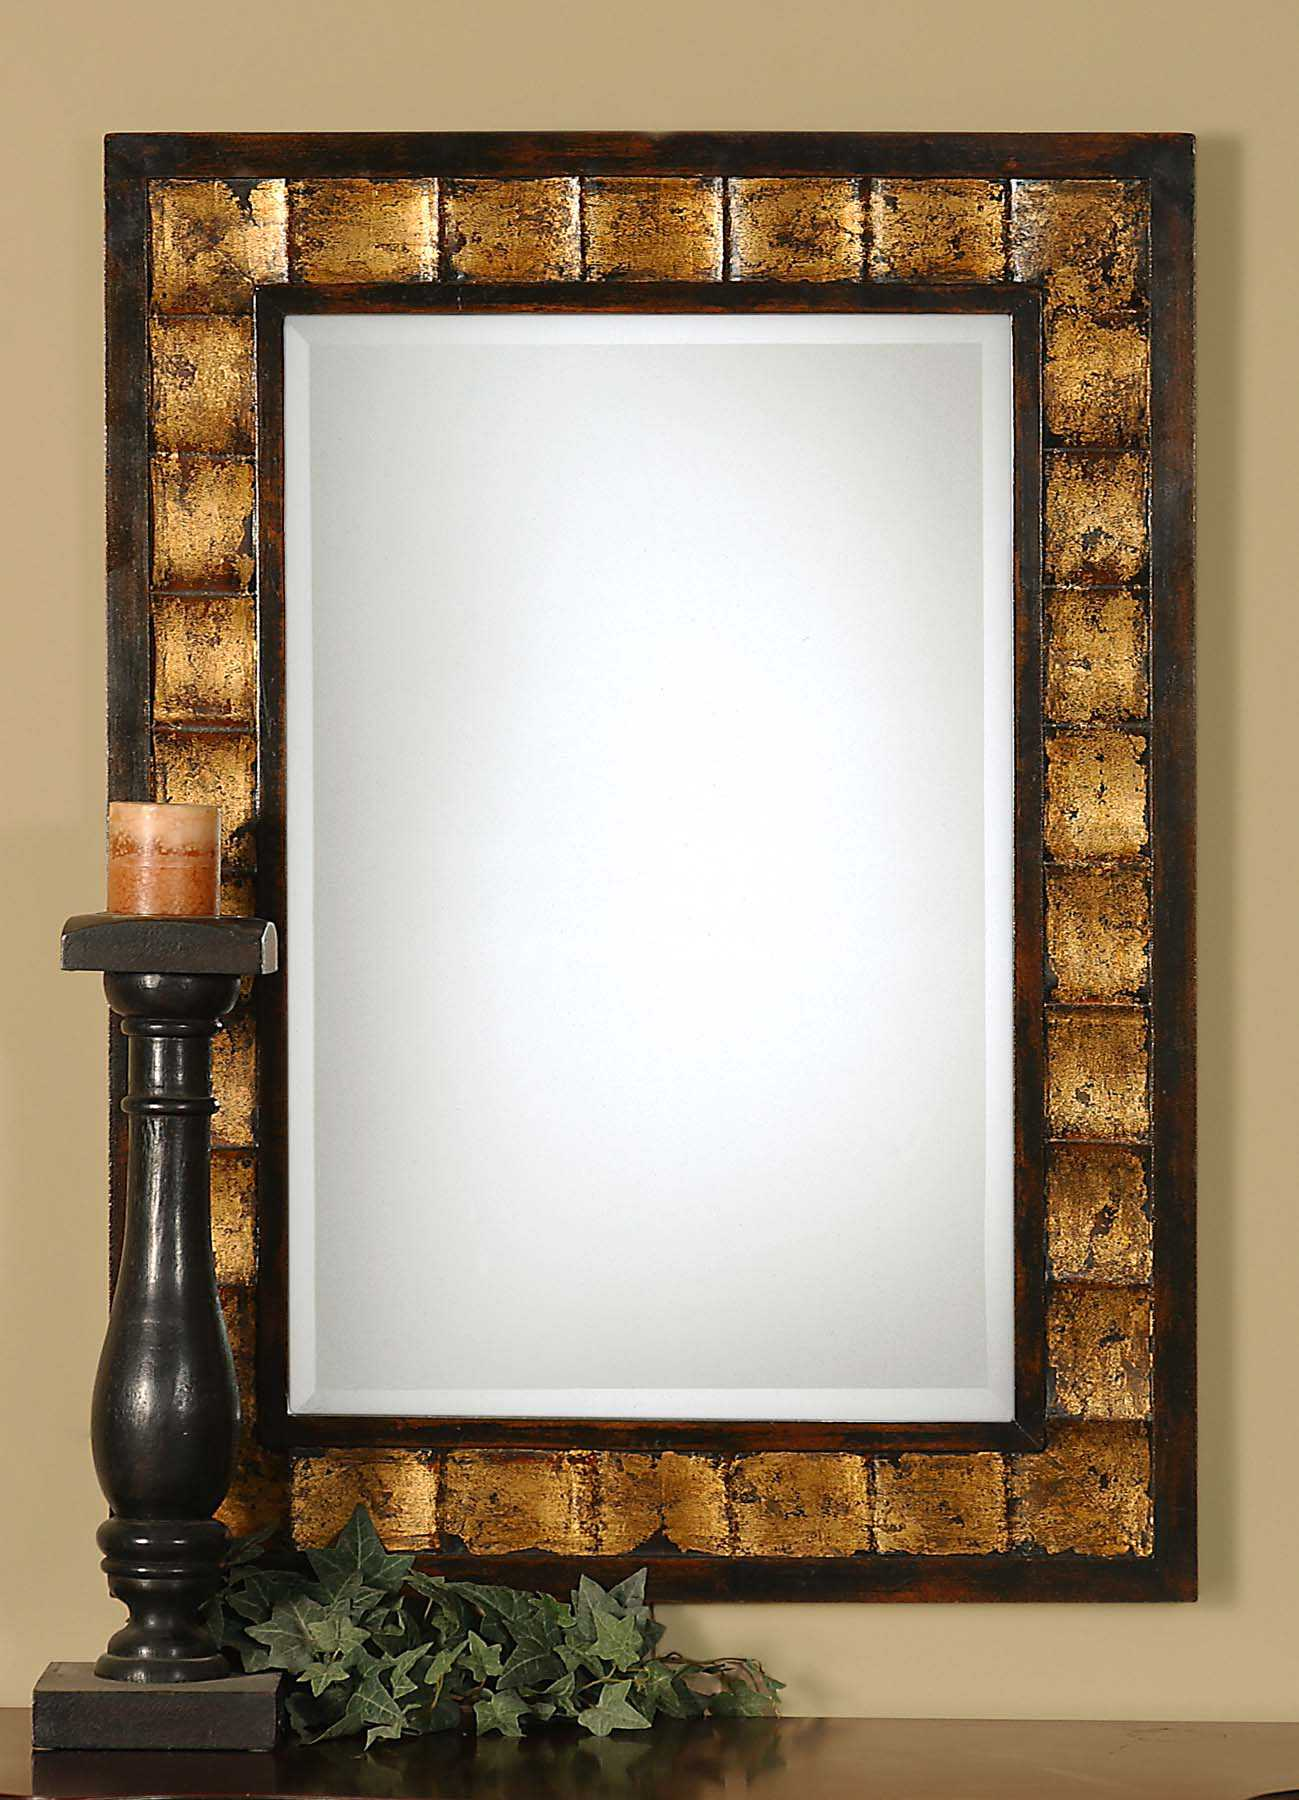 Uttermost Justus 28 X 38 Decorative Gold Wall Mirror